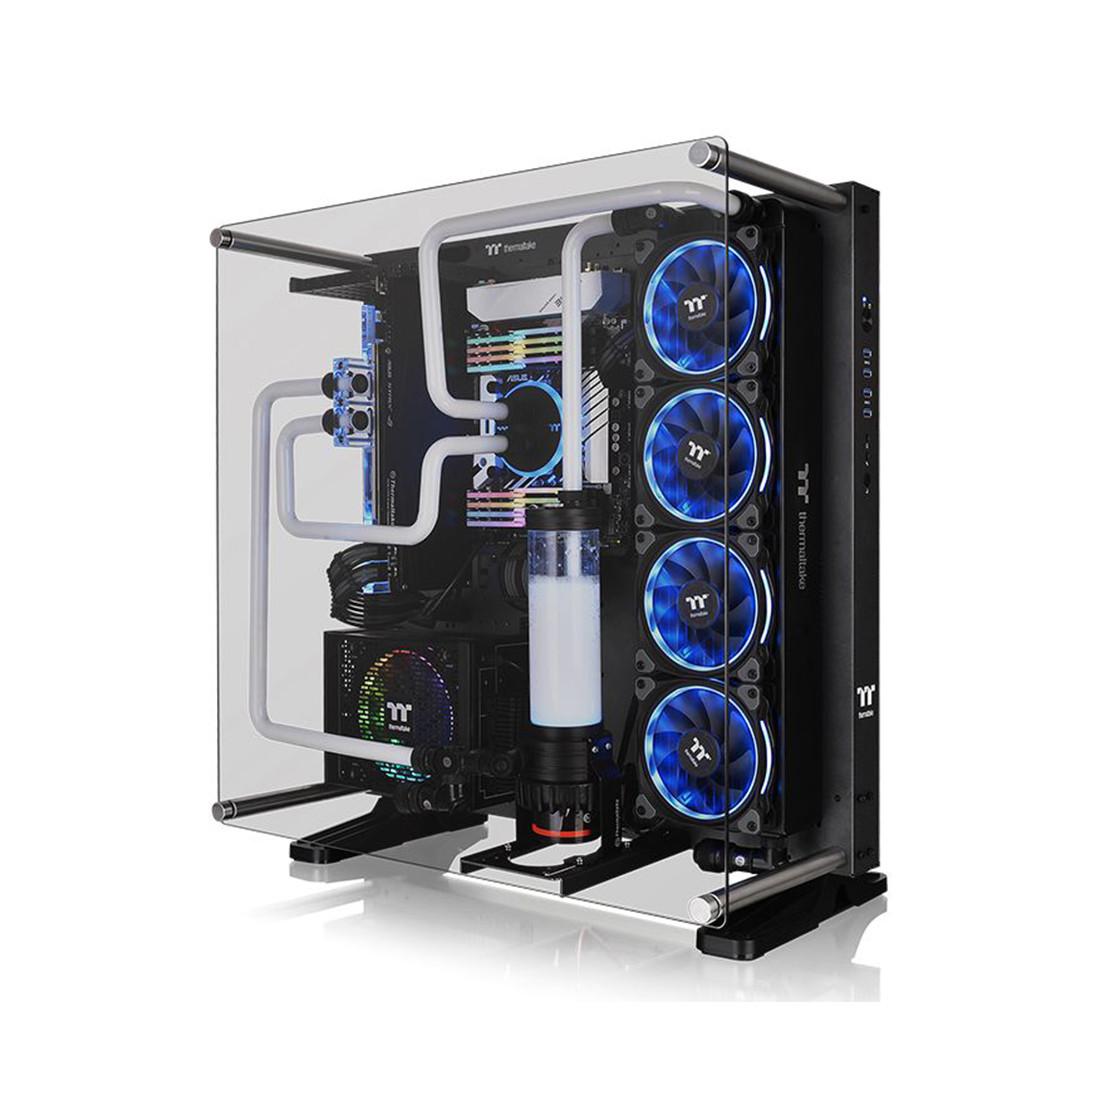 Компьютерный корпус Thermaltake Core P5 TG без Б/П